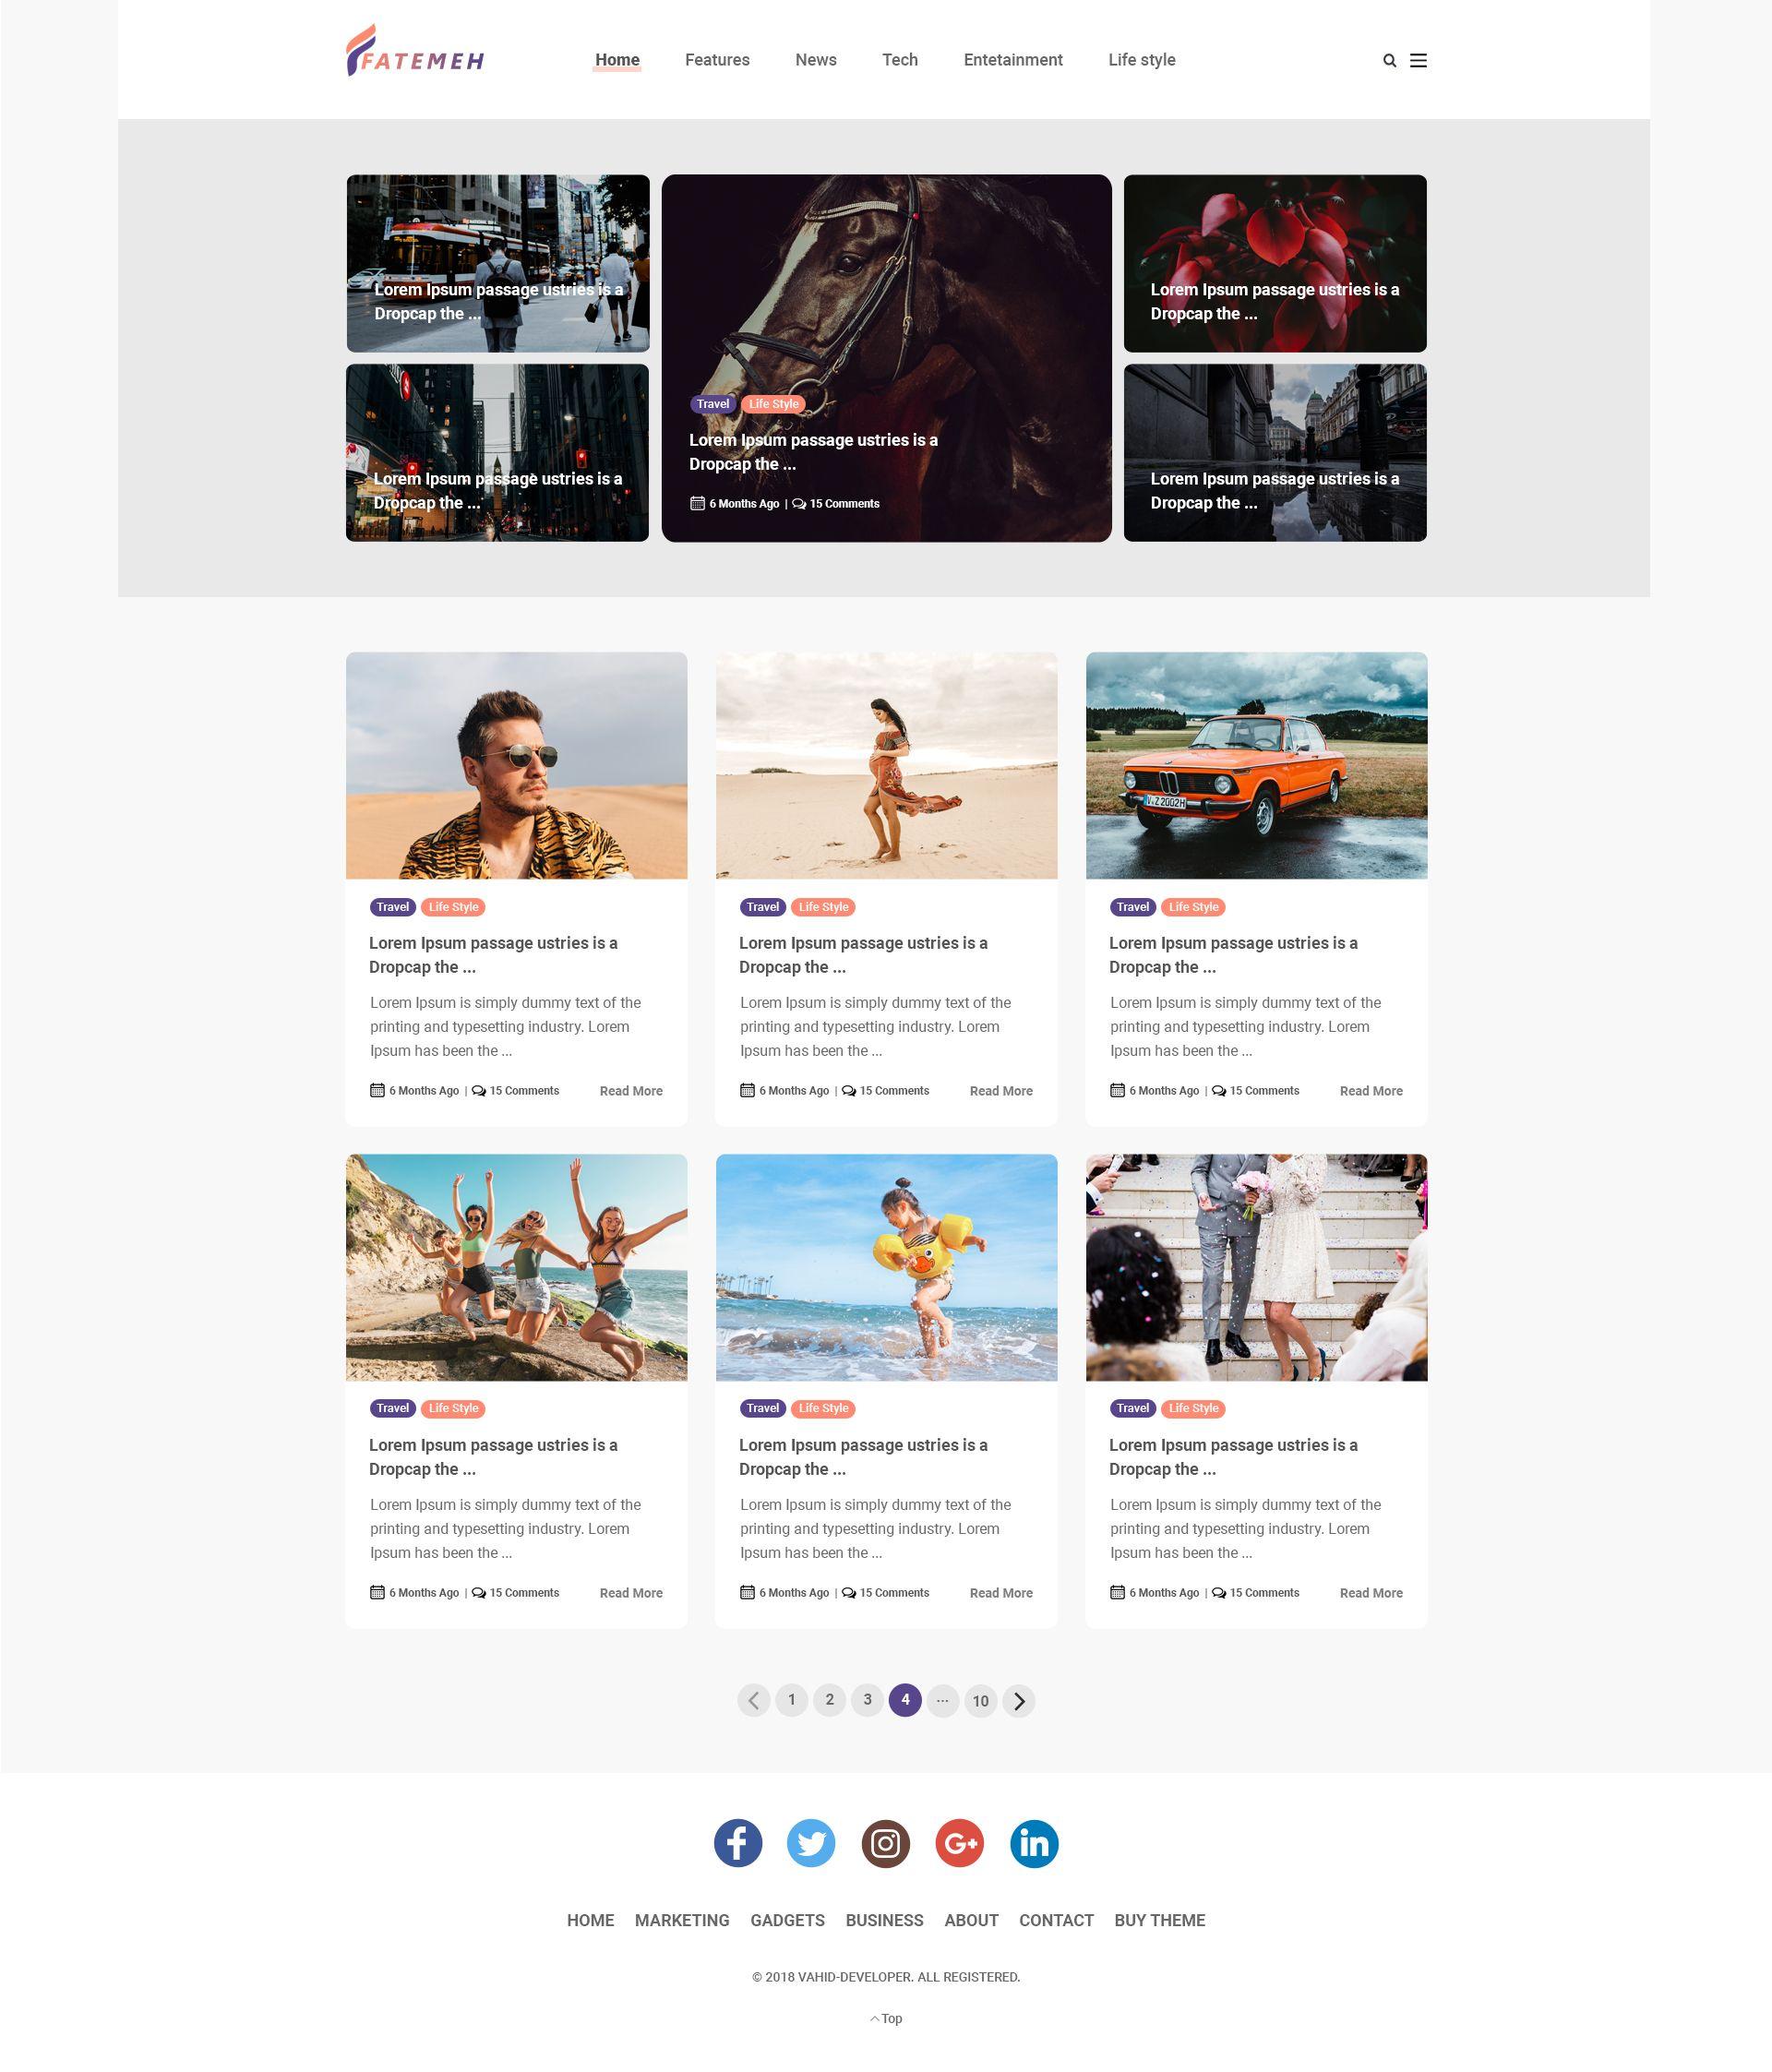 Minimal Responsive Website Template Psd For Free Download: Responsive Modern Minimal Blog #Ad #Responsive